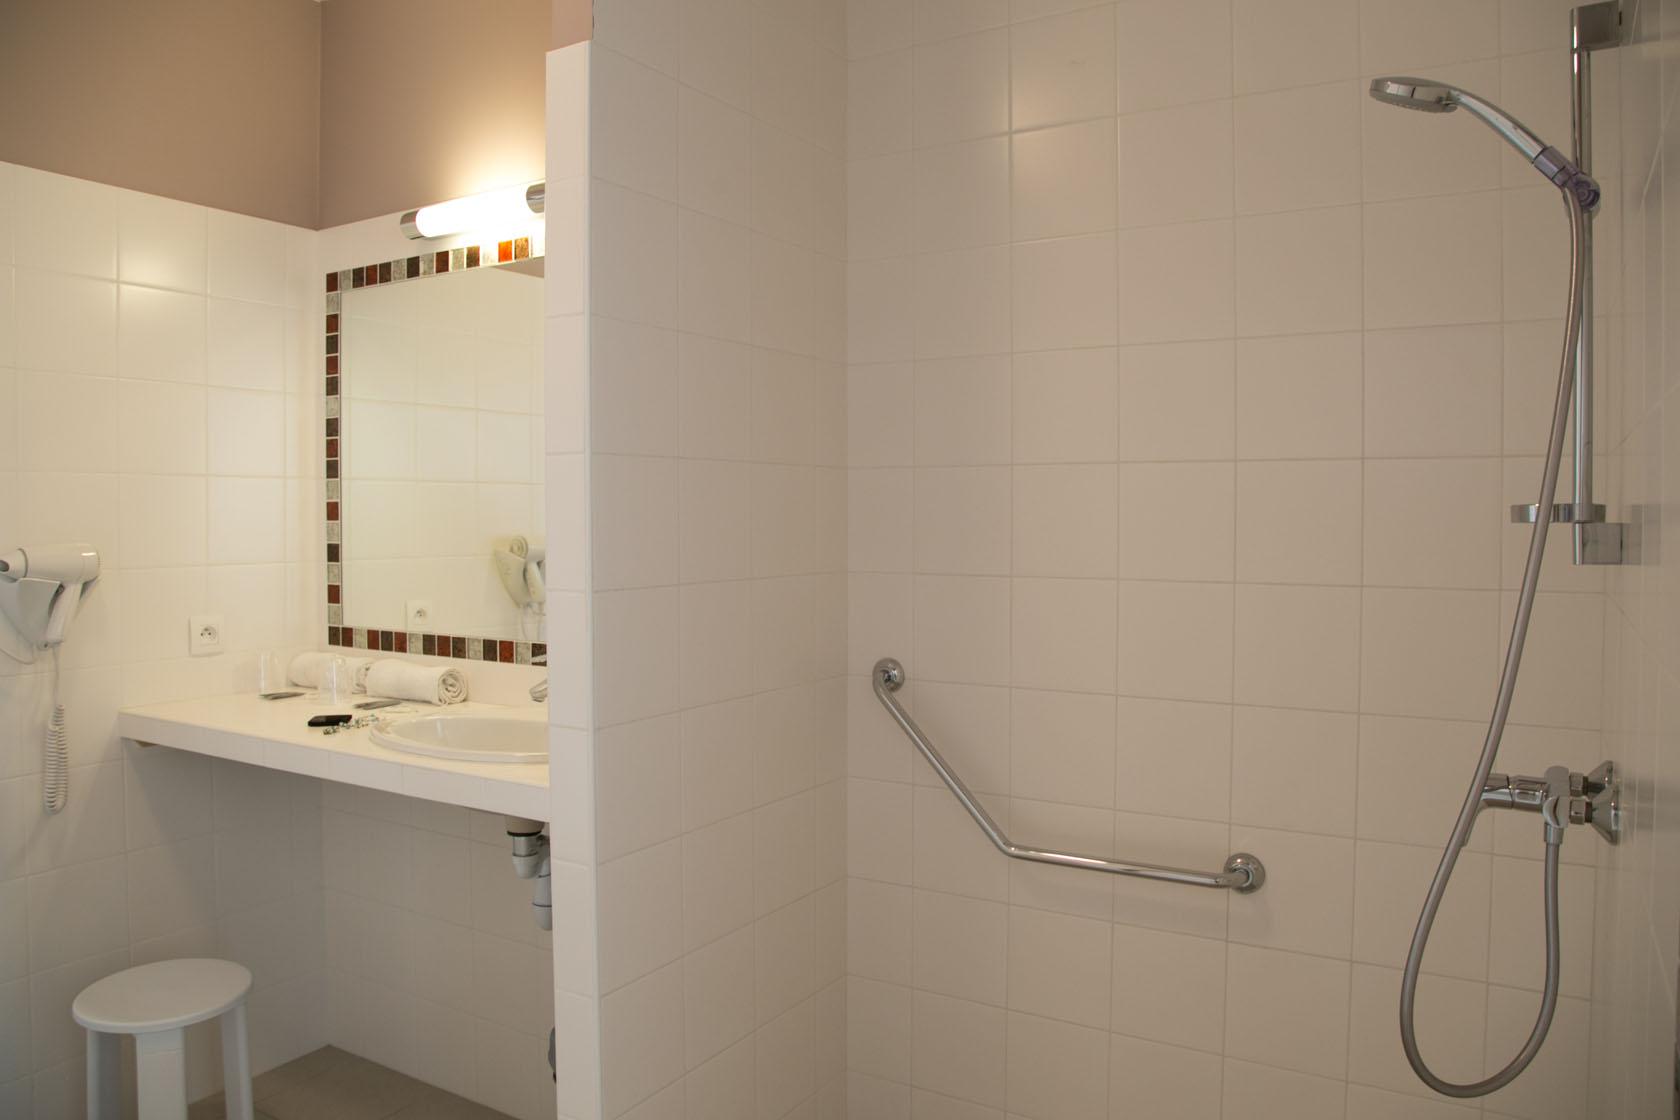 Meuble Salle De Bain Lapeyre Belle Epoque ~ Chambre Pmr Hotel Vue Mer Yeu Chambres D Hotel Port Joinville